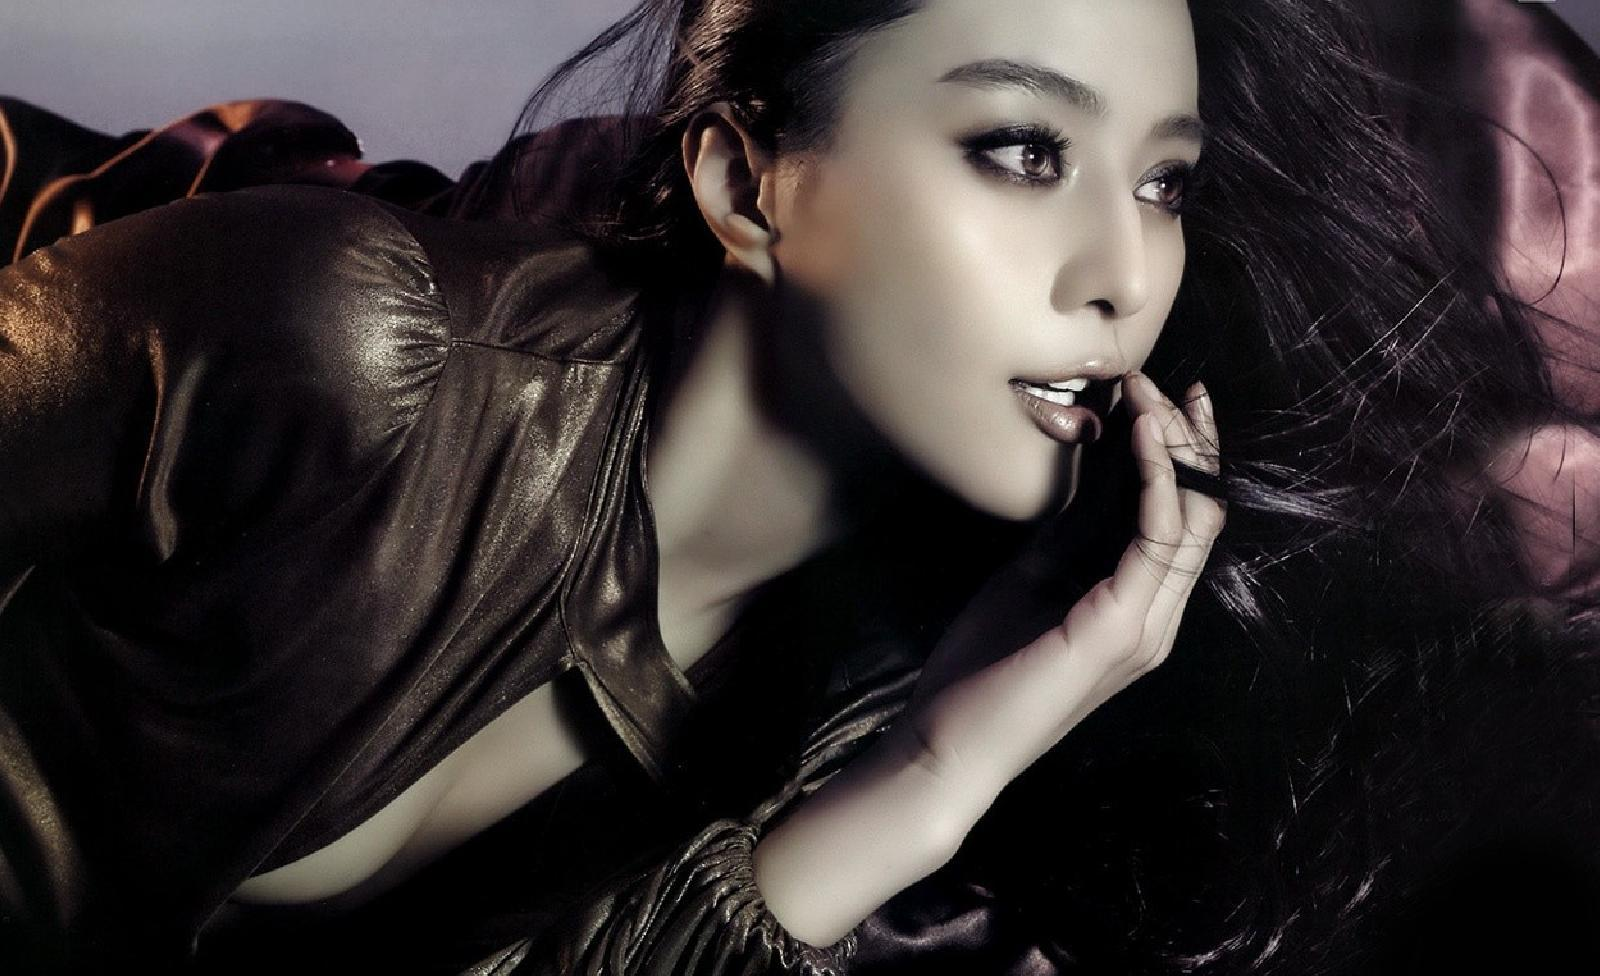 fan bingbing wallpaper and background image   1600x976   id:367768